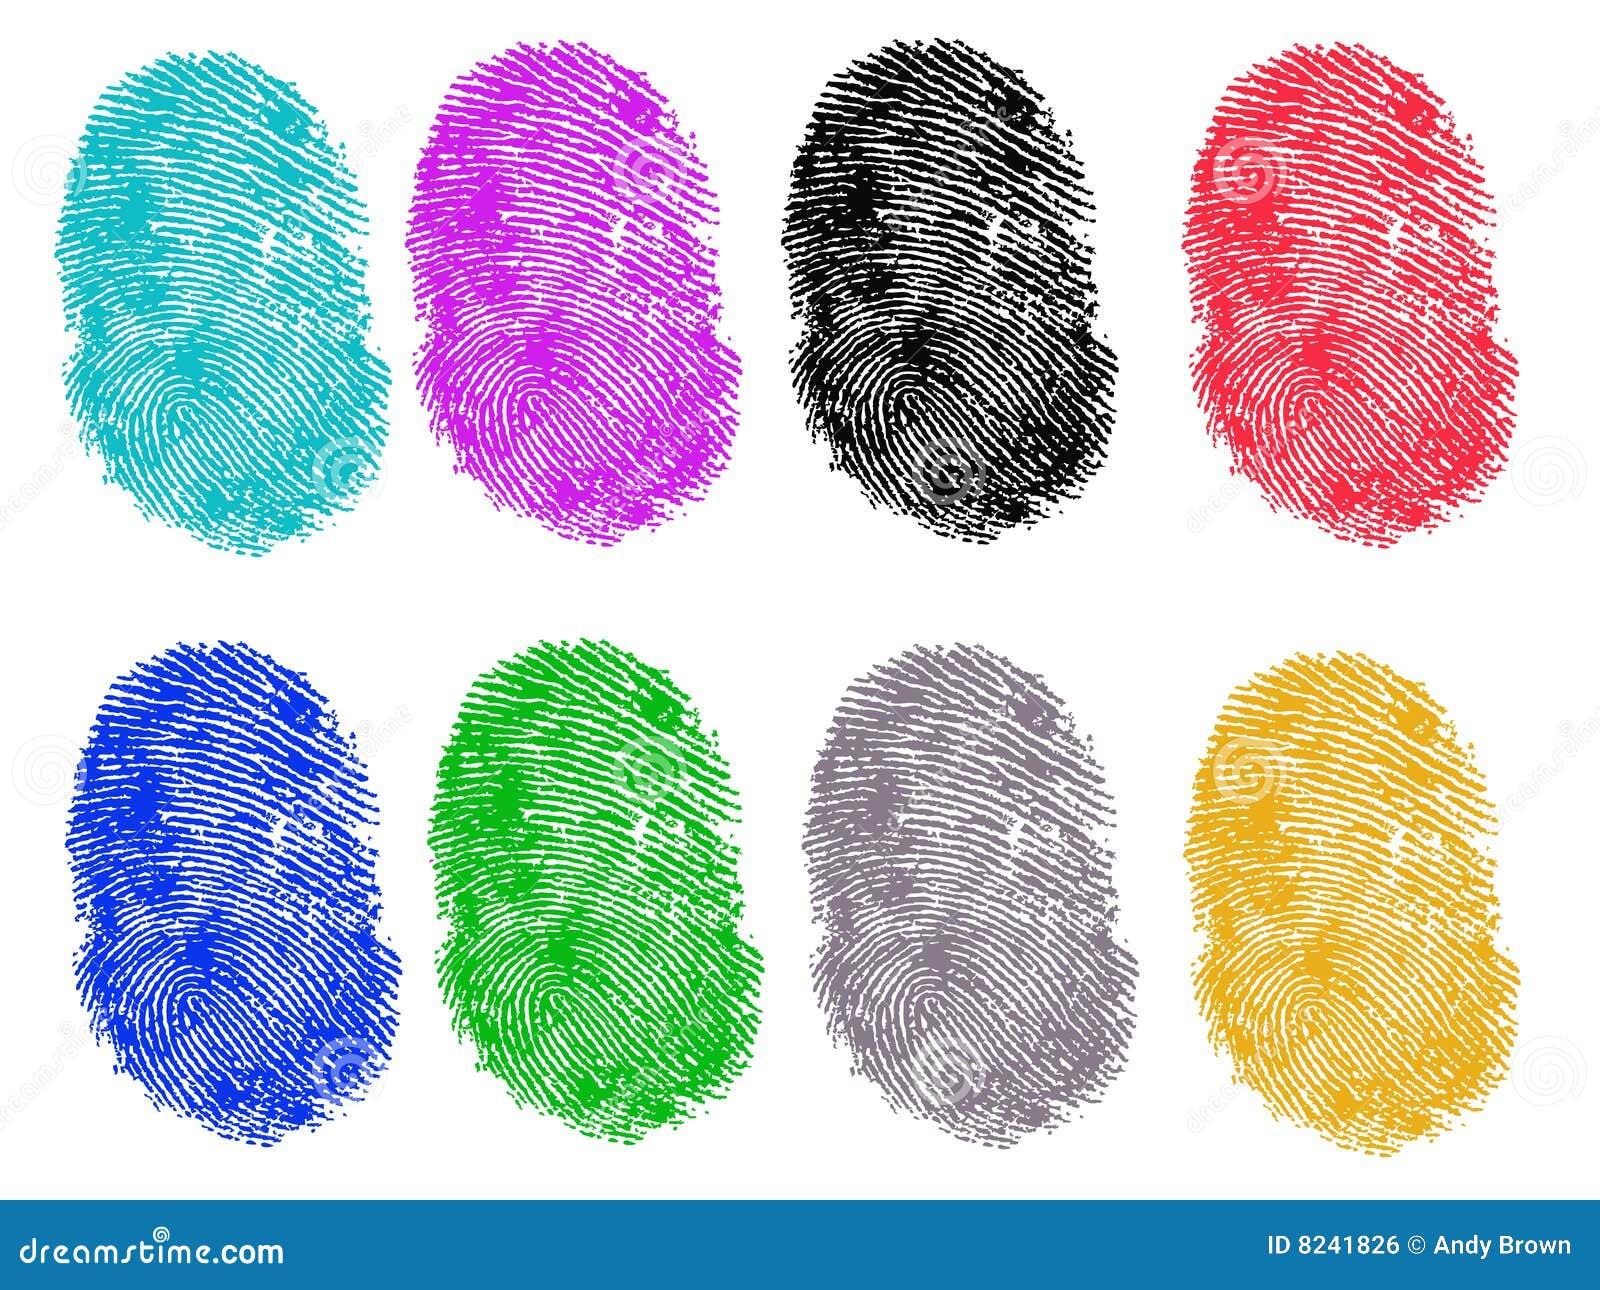 8 colored fingerprints royalty free stock image image